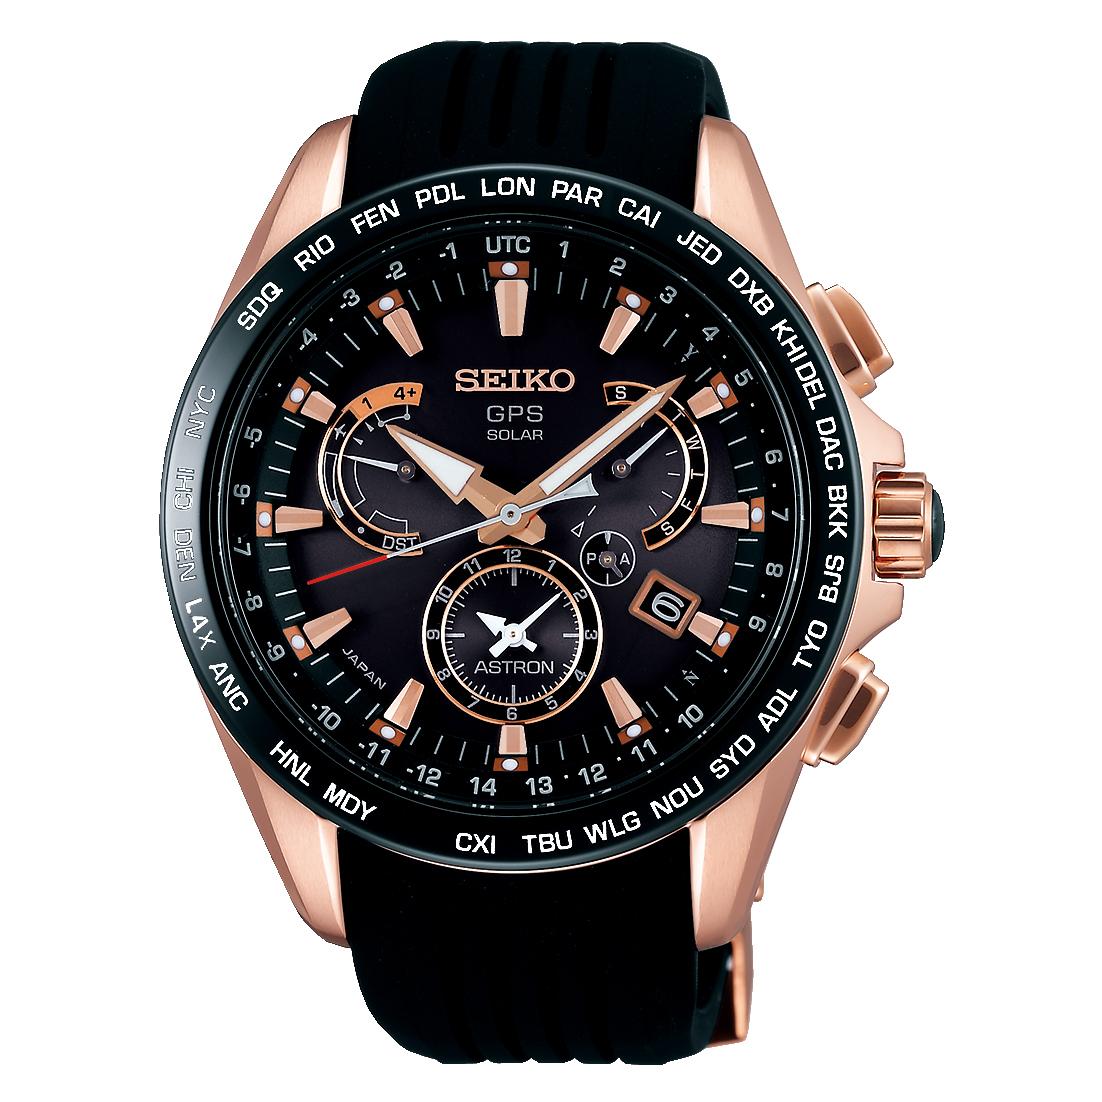 SEIKO ASTRON/セイコー アストロン SBXB055 8X Series Dual-Time デュアルタイム 8X53 Stainless Steel Models ステンレススチールモデル